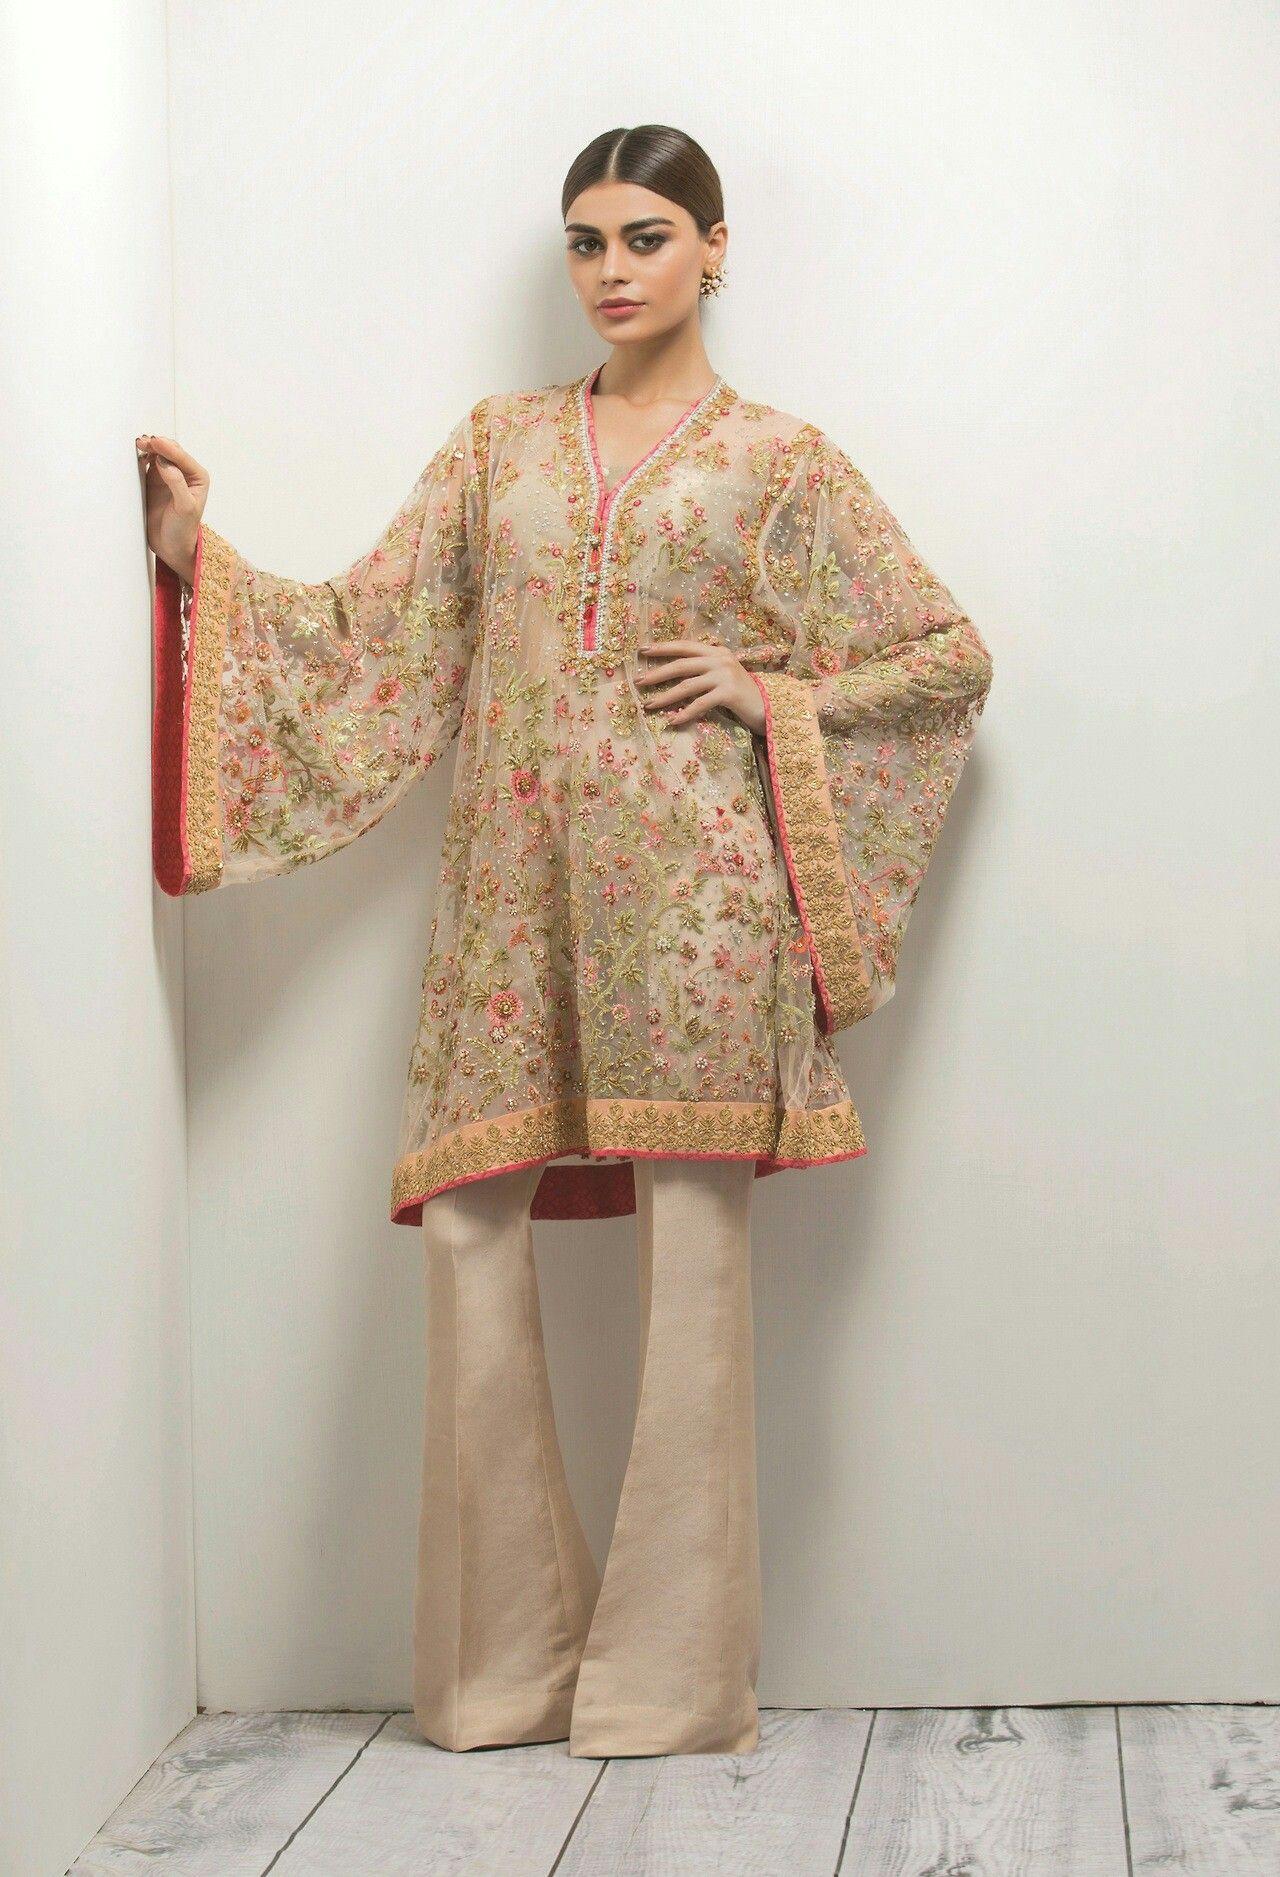 Pin by lima on eid outfit inspo pinterest shalwar kameez eid